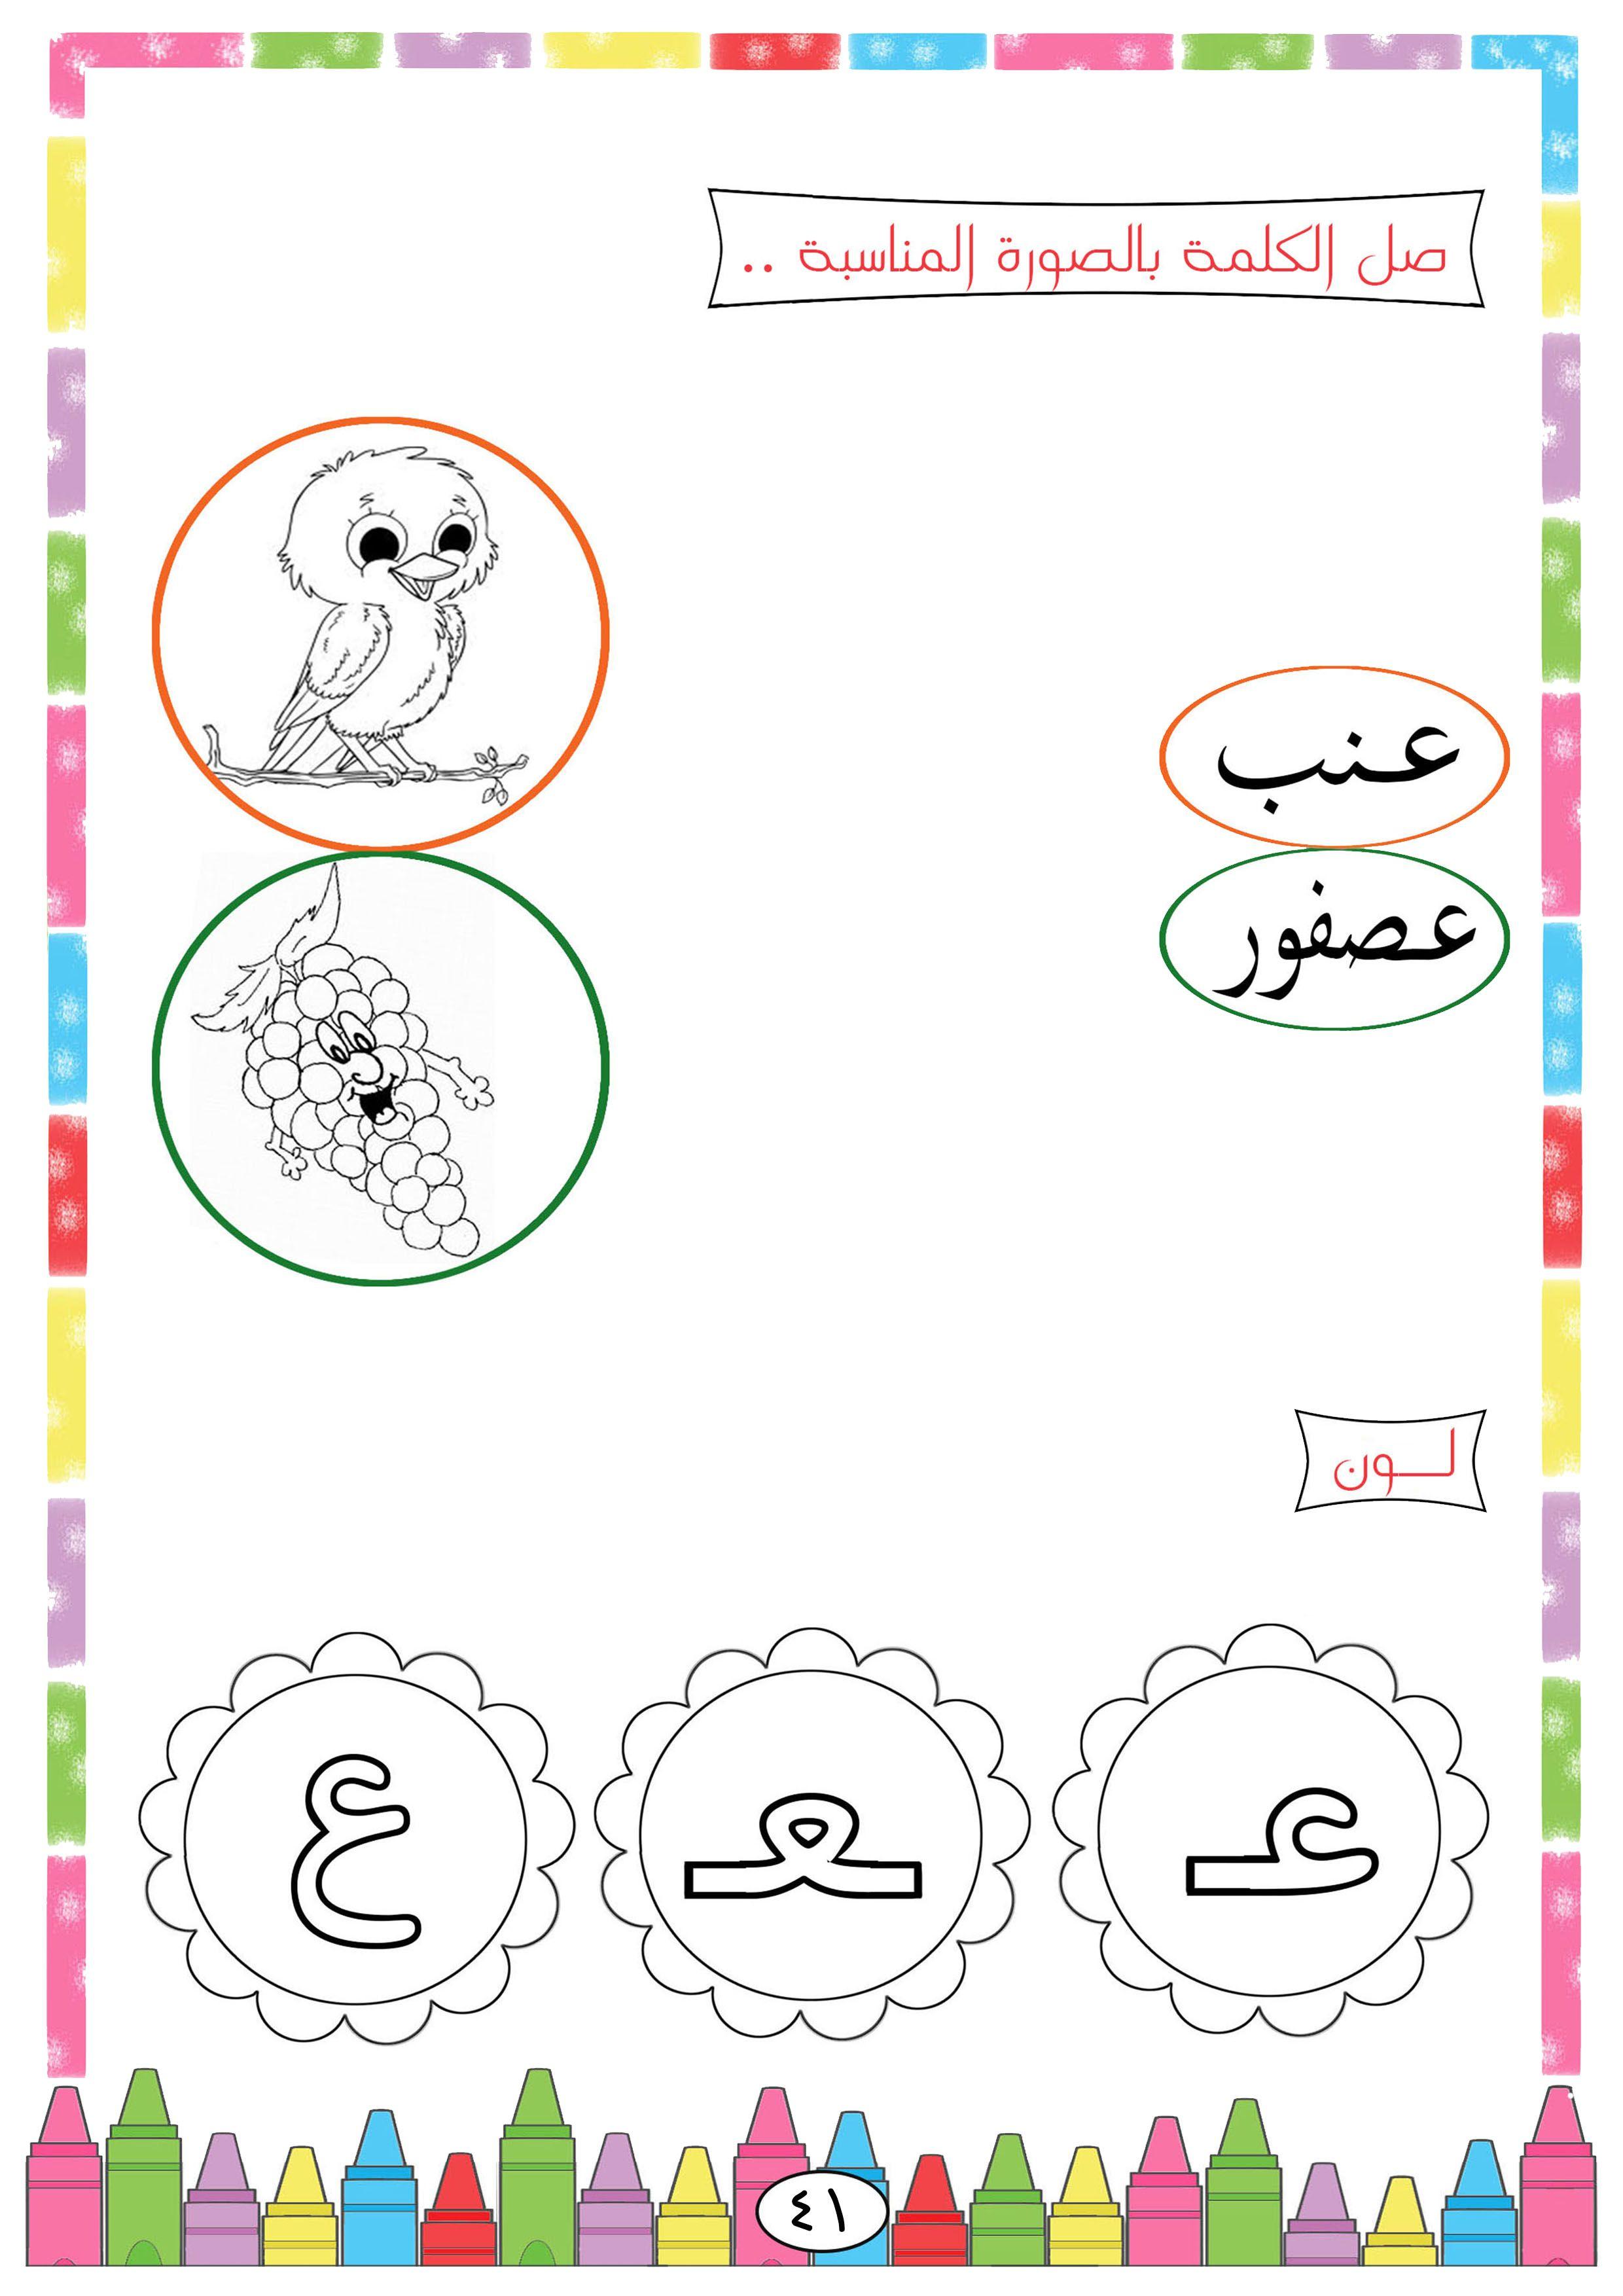 Pin By Rania Ahmed On كتاب ١ Learning Arabic Arabic Alphabet For Kids Learn Arabic Language